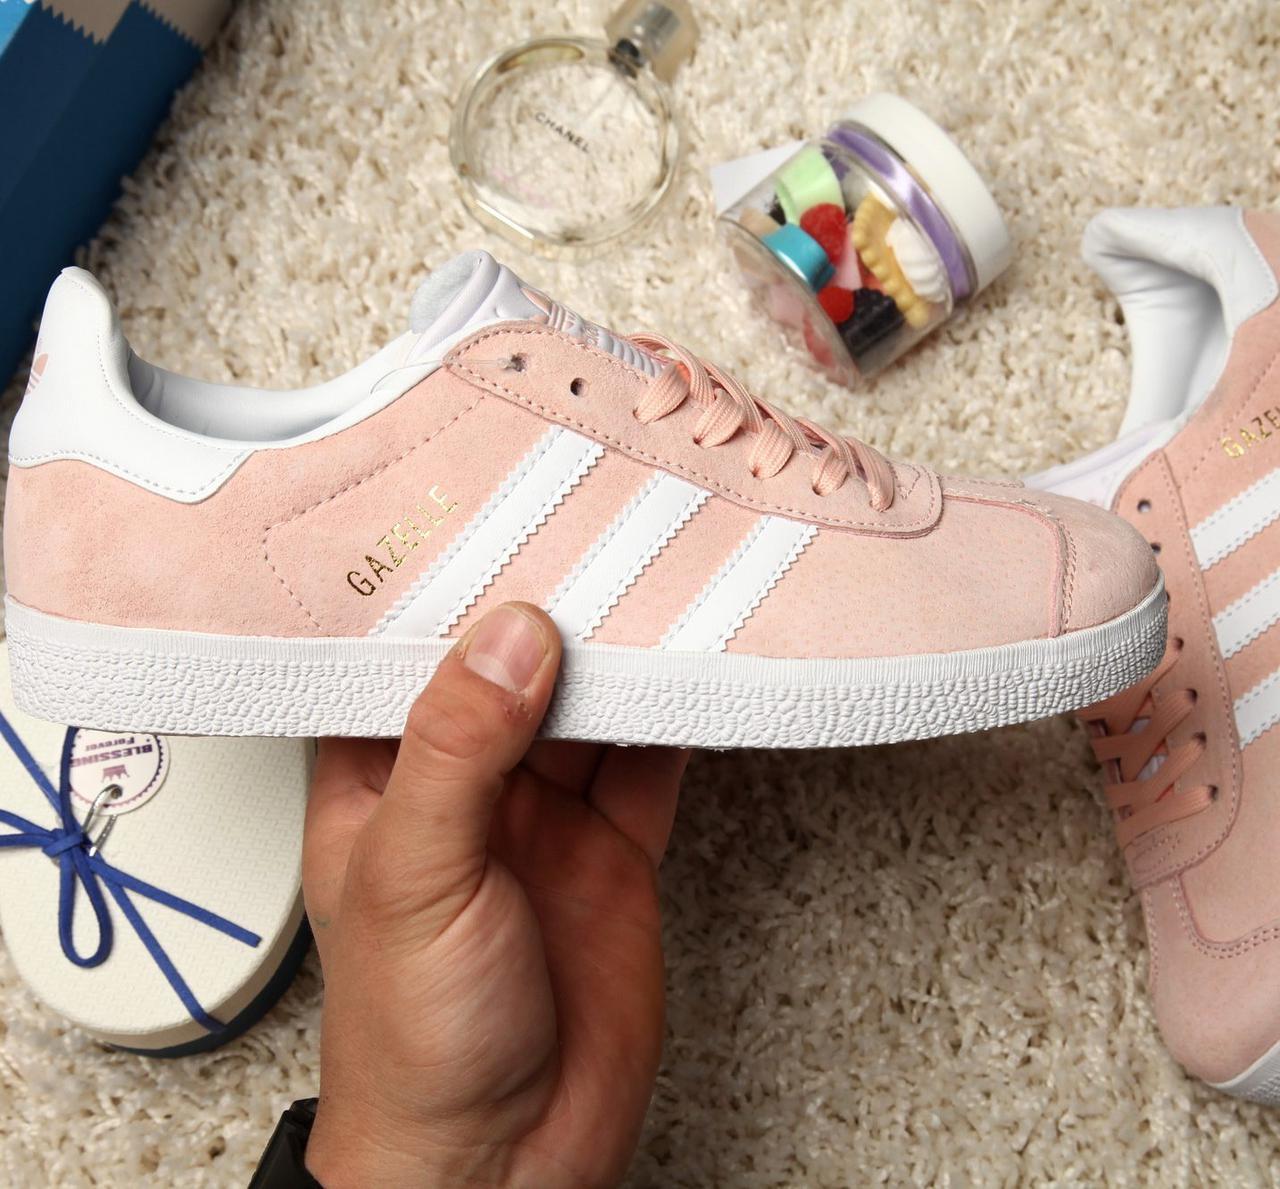 07d7a54700a Женские кроссовки Adidas Gazelle Vapour Pink White - Интернет-магазин обуви  Bootlords в Киеве